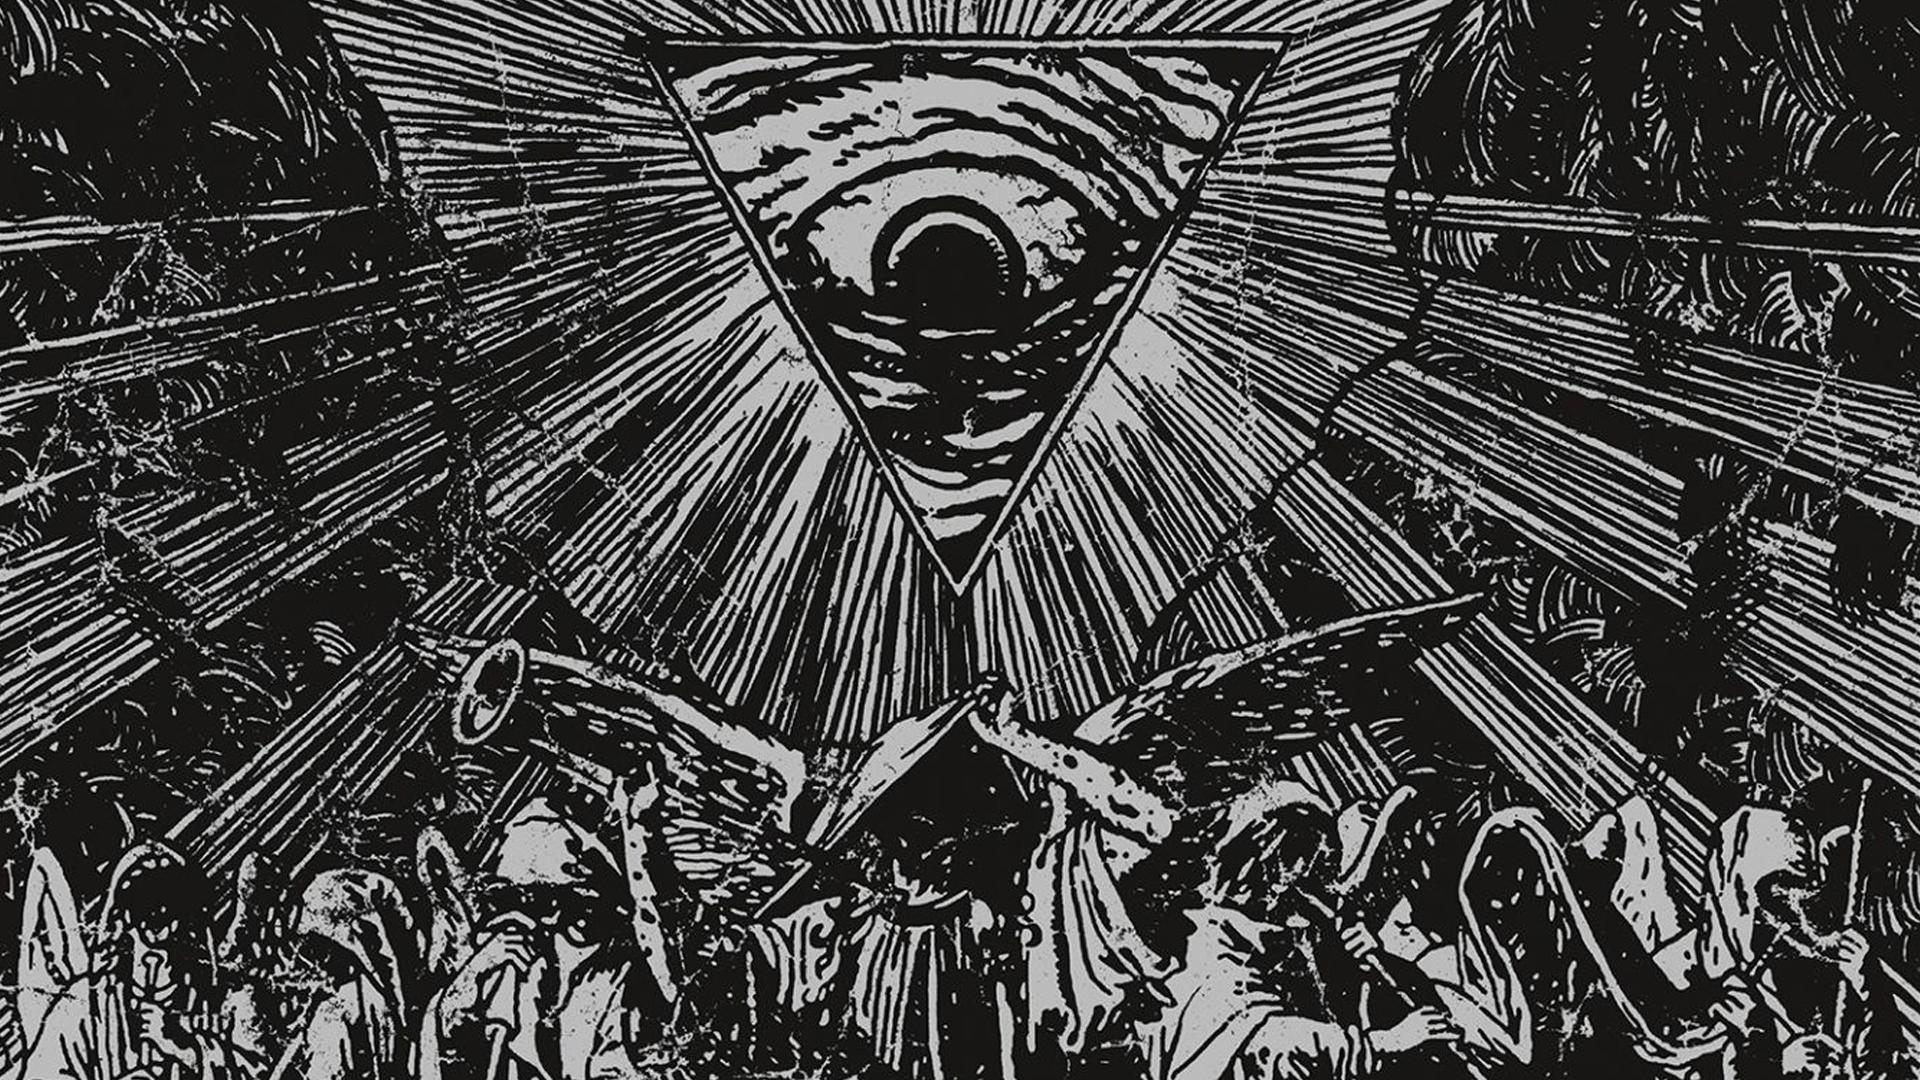 Orchestra Album Covers Black Metal Pyramids Watain Wallpaper